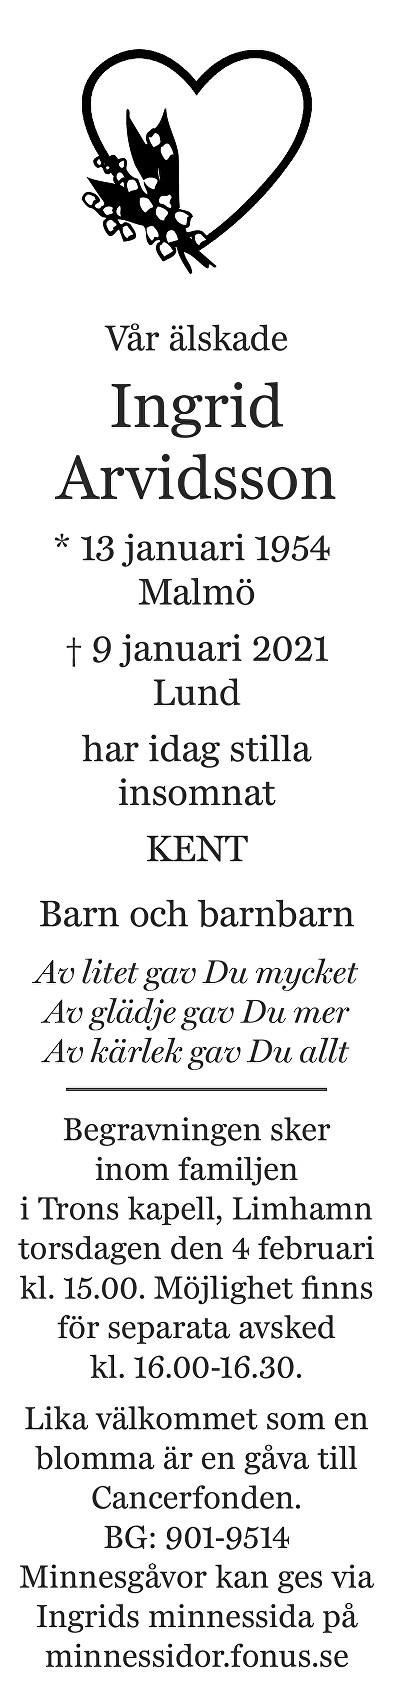 Ingrid Arvidsson Death notice